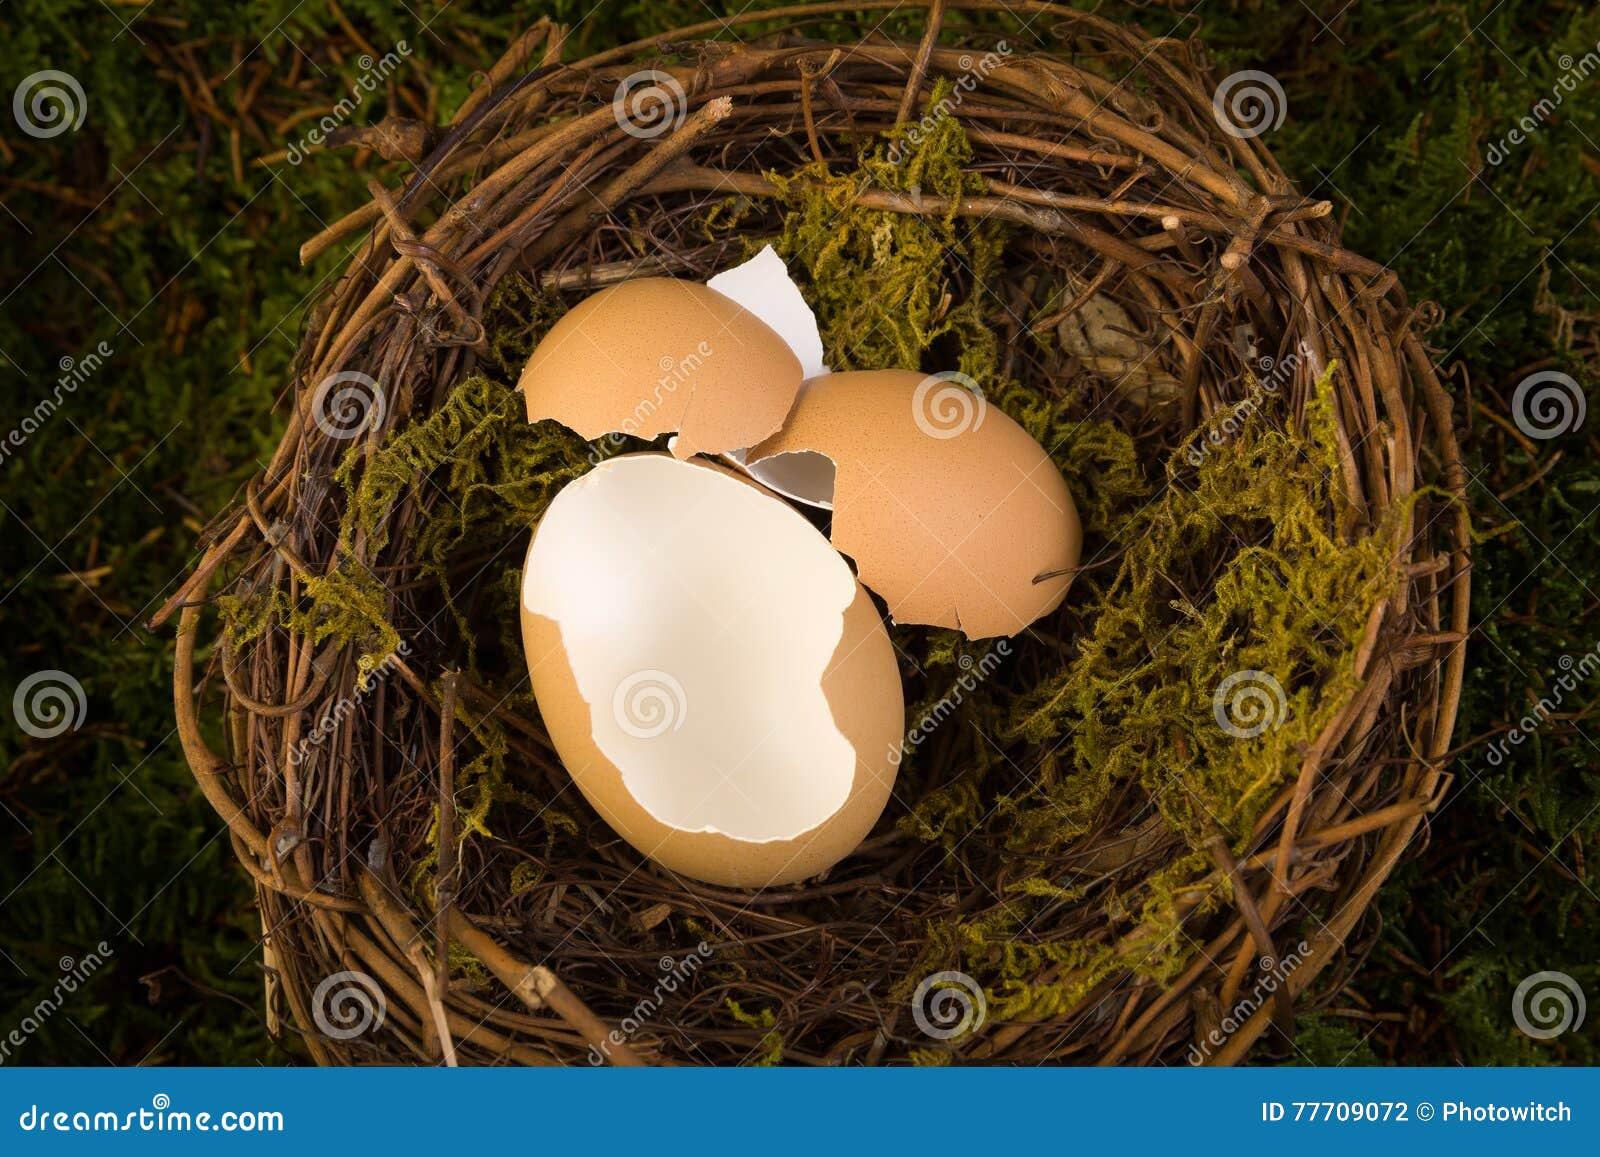 Contesto digitale del nido del bambino